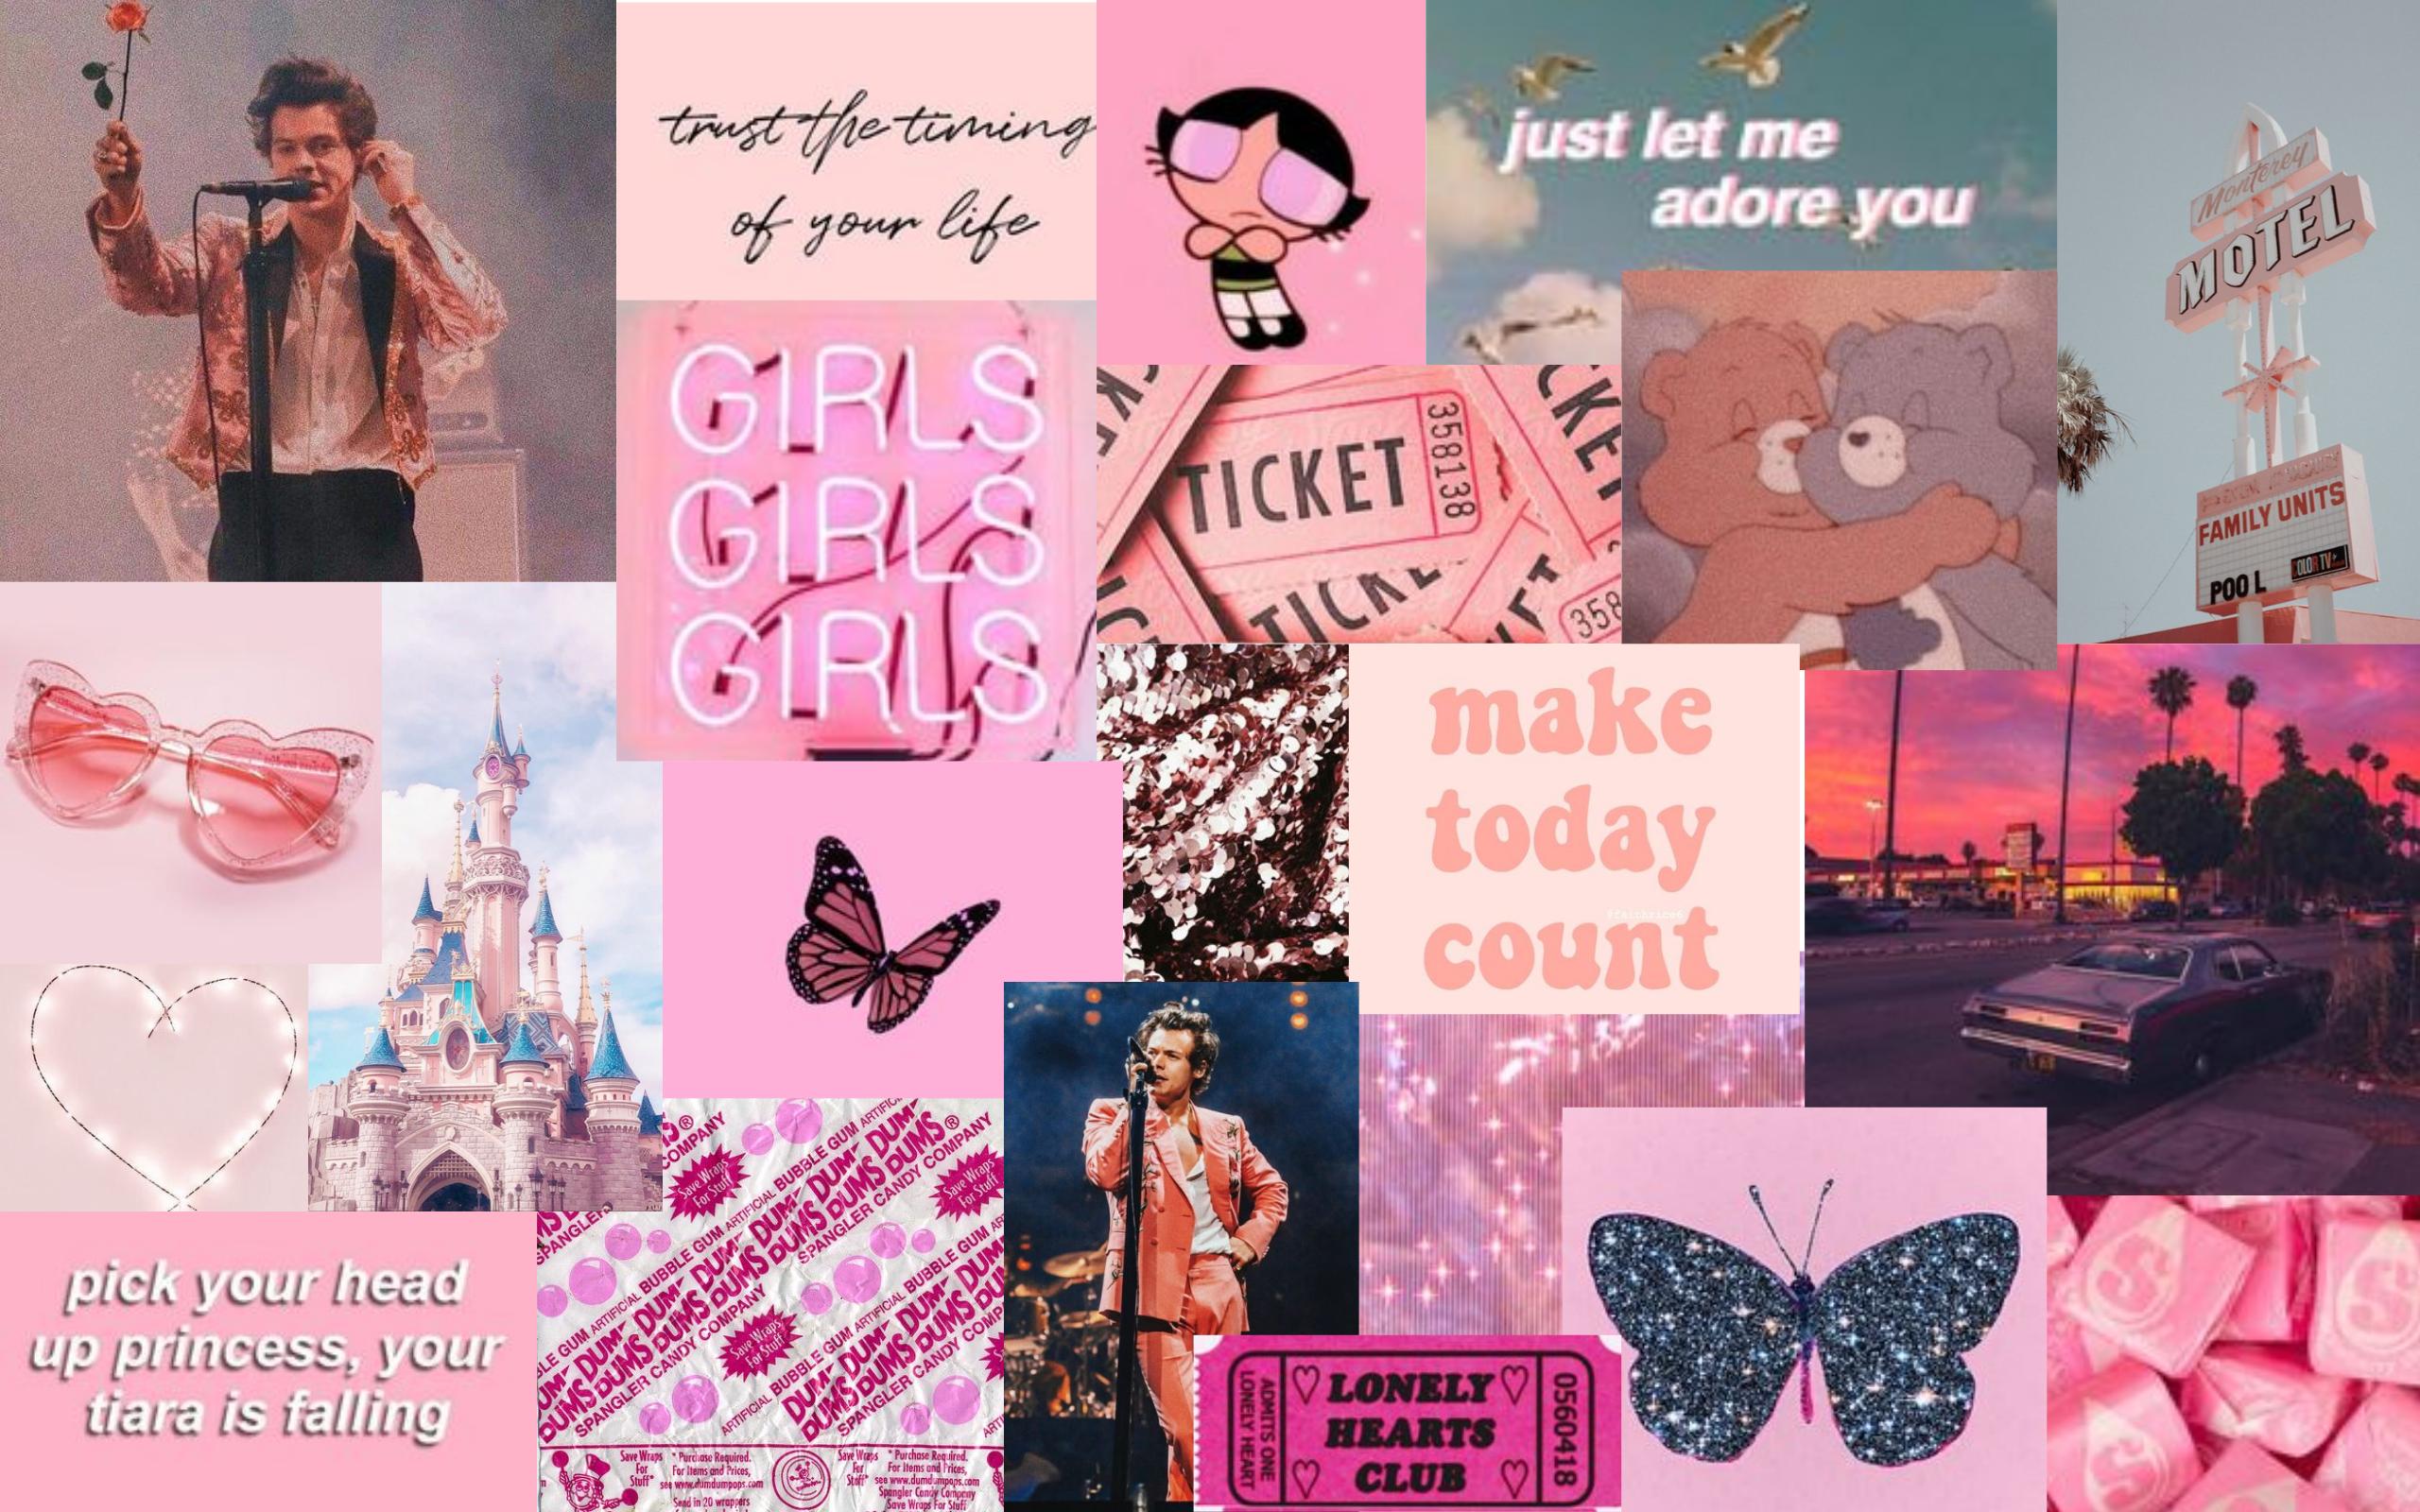 pink aesthetic wallpaper in 2020 Aesthetic desktop